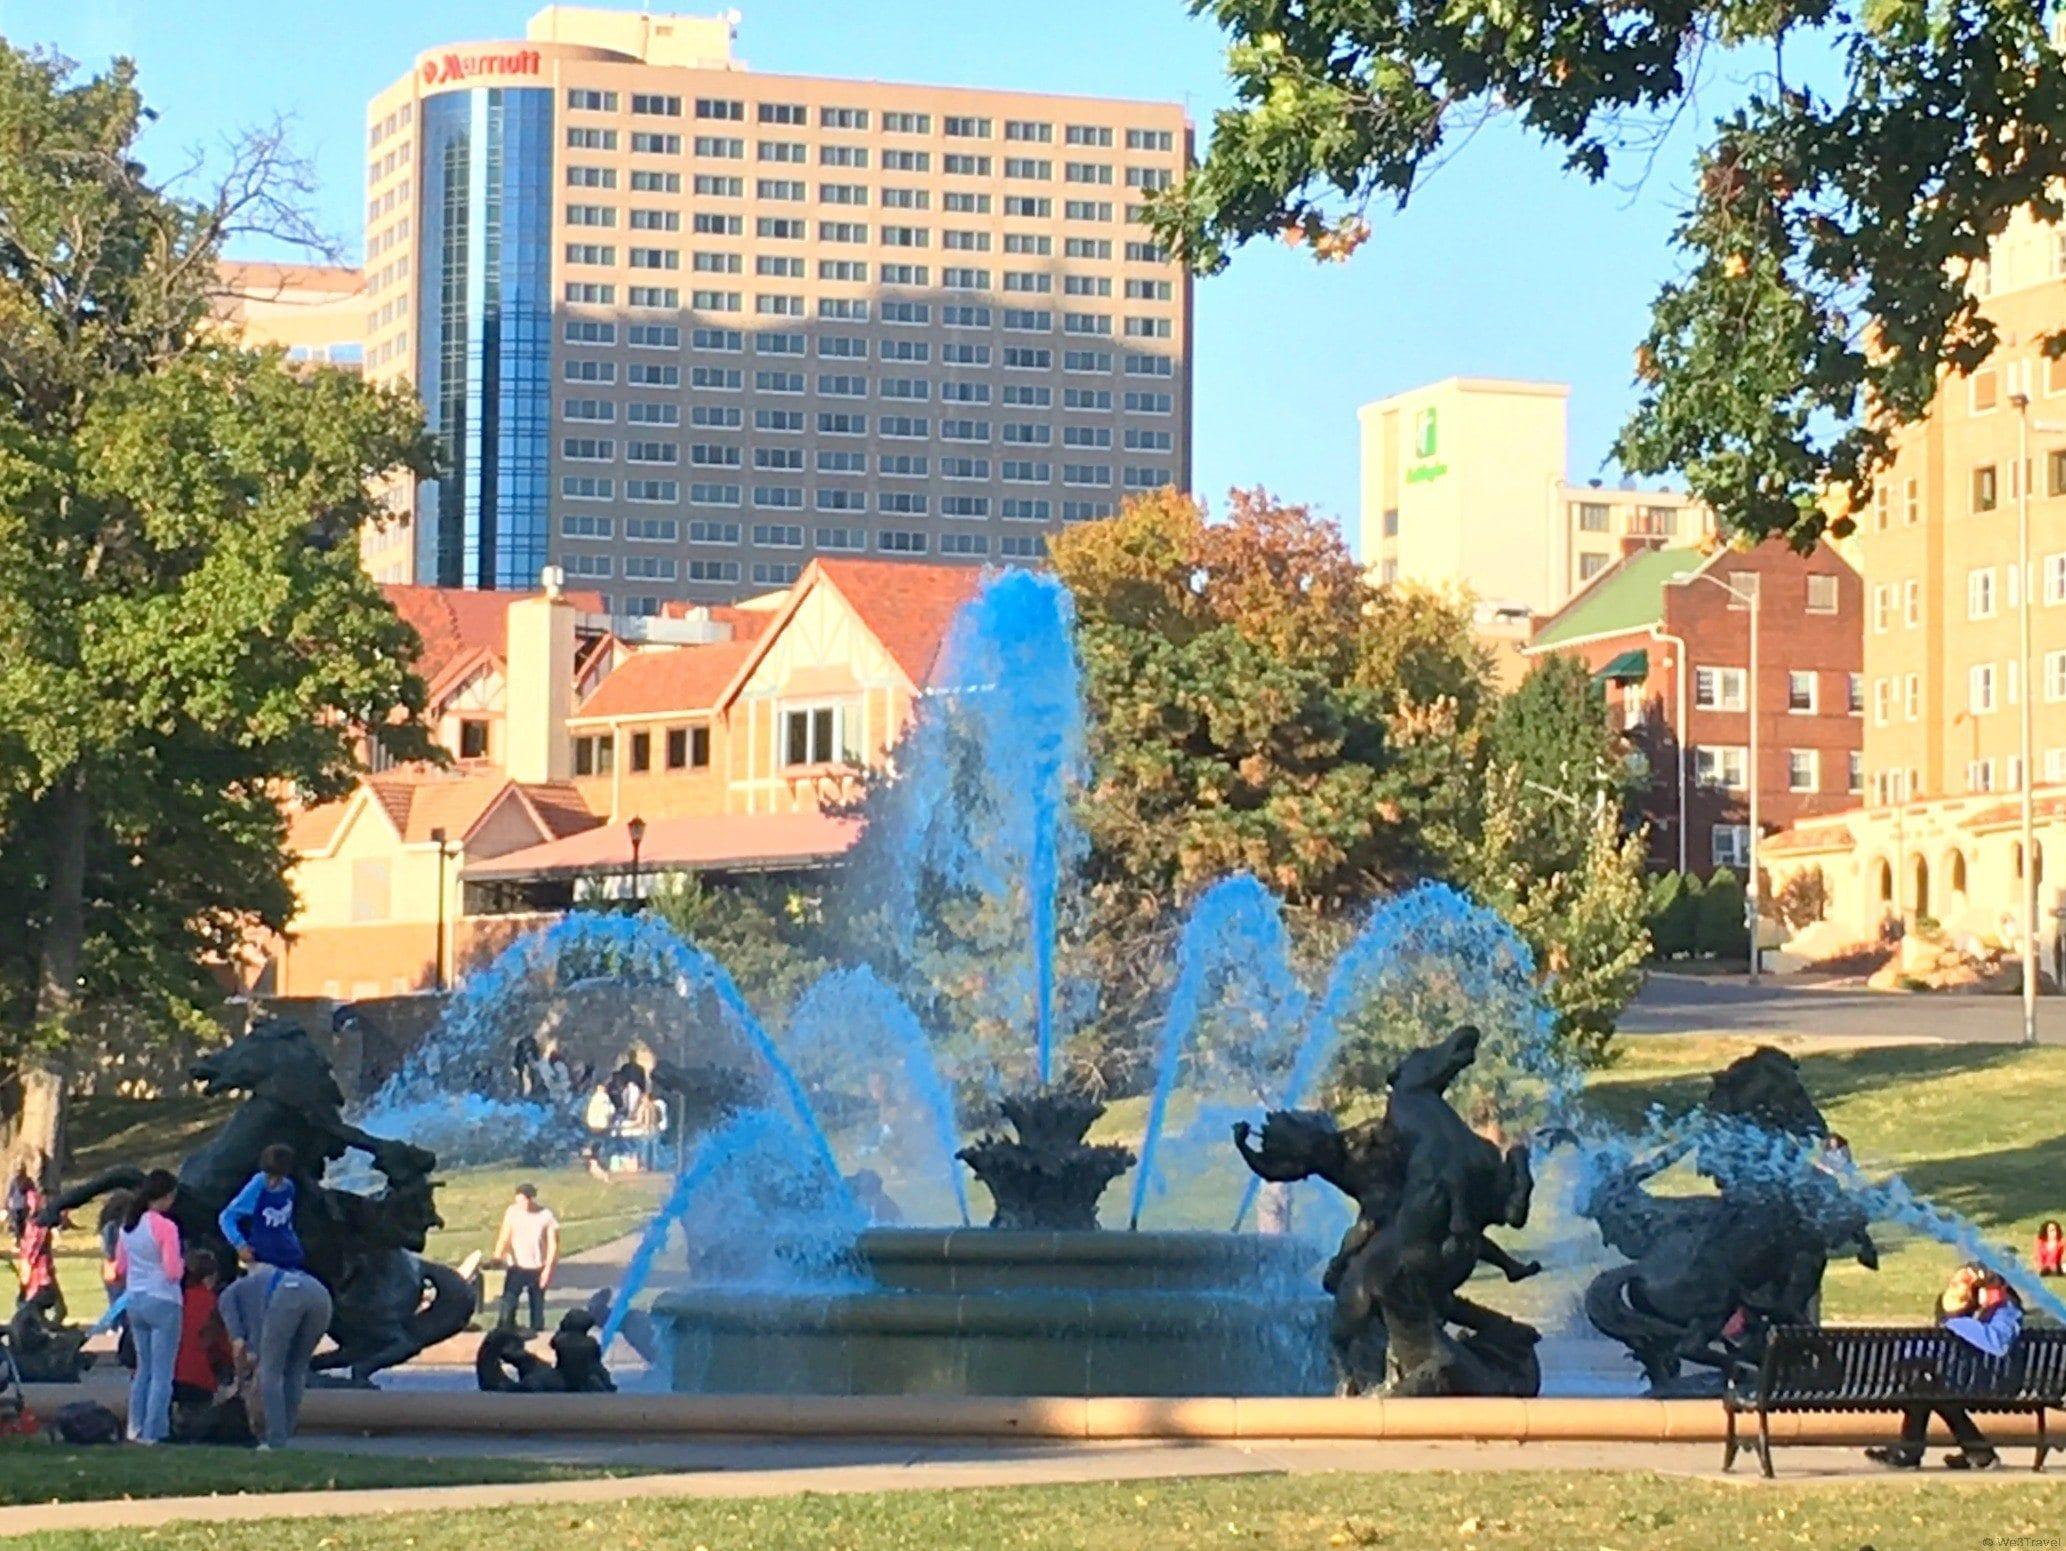 Kansas City Fountain -- what to do in Kansas City with kids